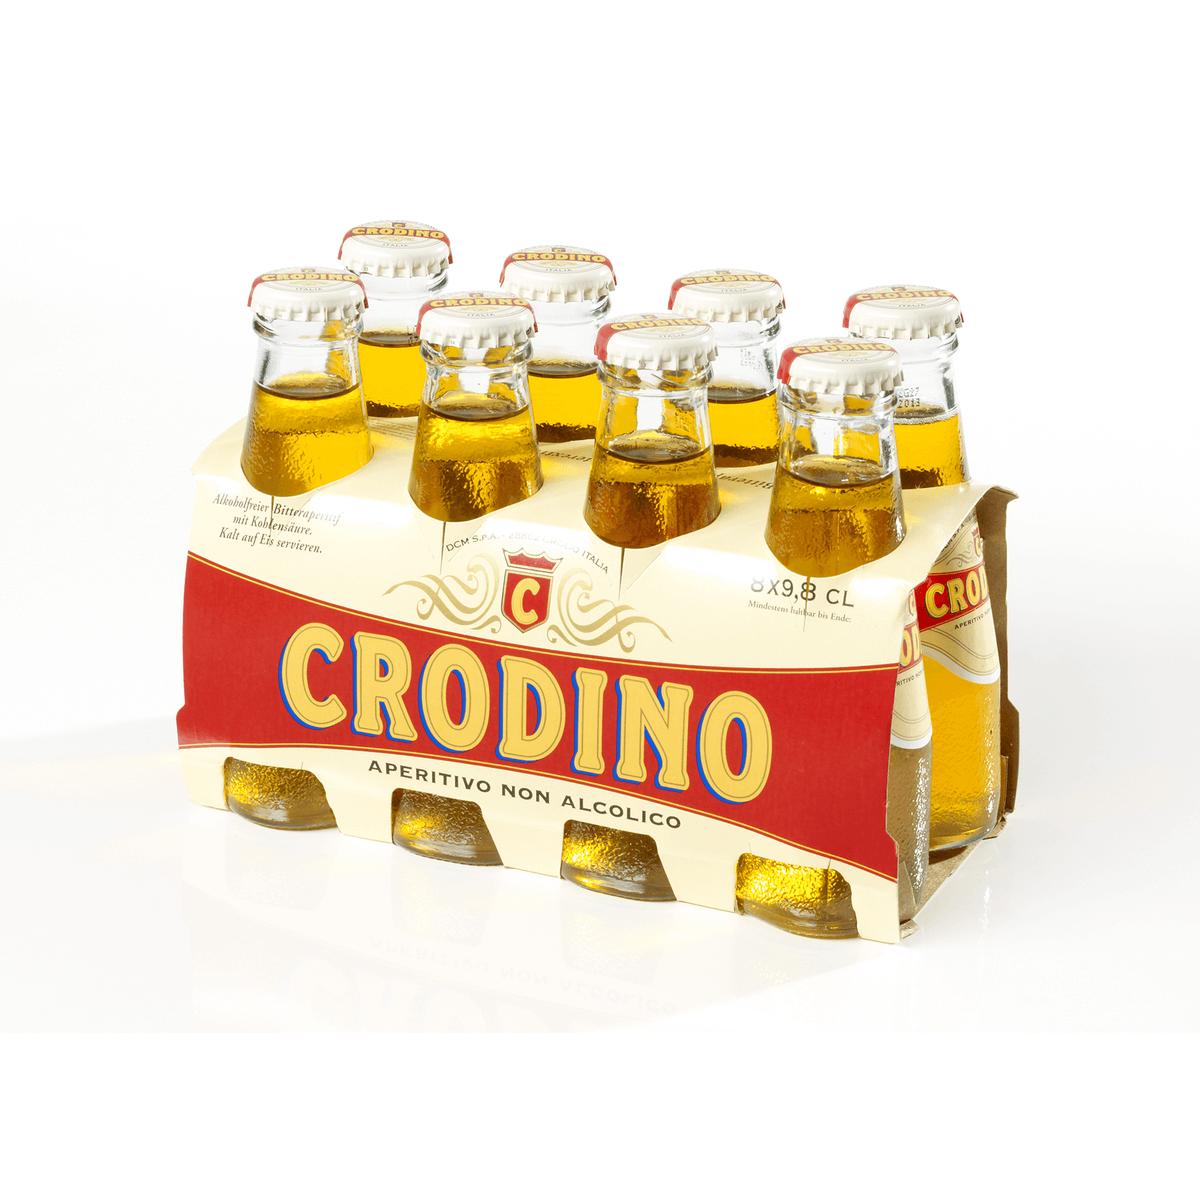 CRODINO 8x9,8cl   Cola, Limonaden & Co   Alkoholfreie Getränke ...